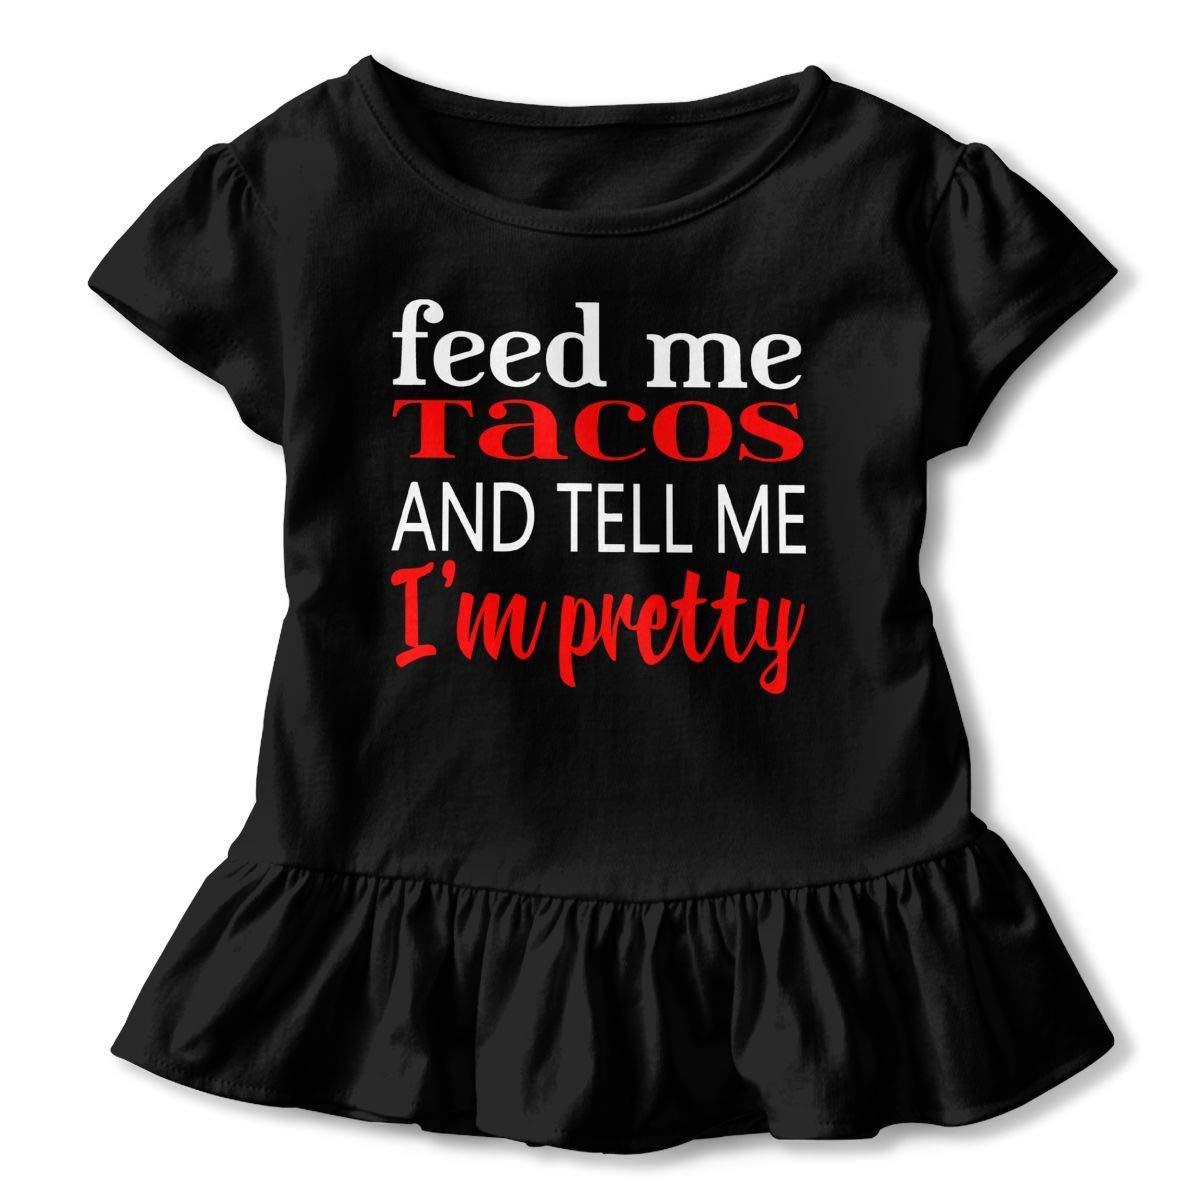 PMsunglasses Short-Sleeve Feed Me Tacos and Tell Me Im Pretty Shirts for Kids 2-6T Fashion Sweatshirt with Falbala